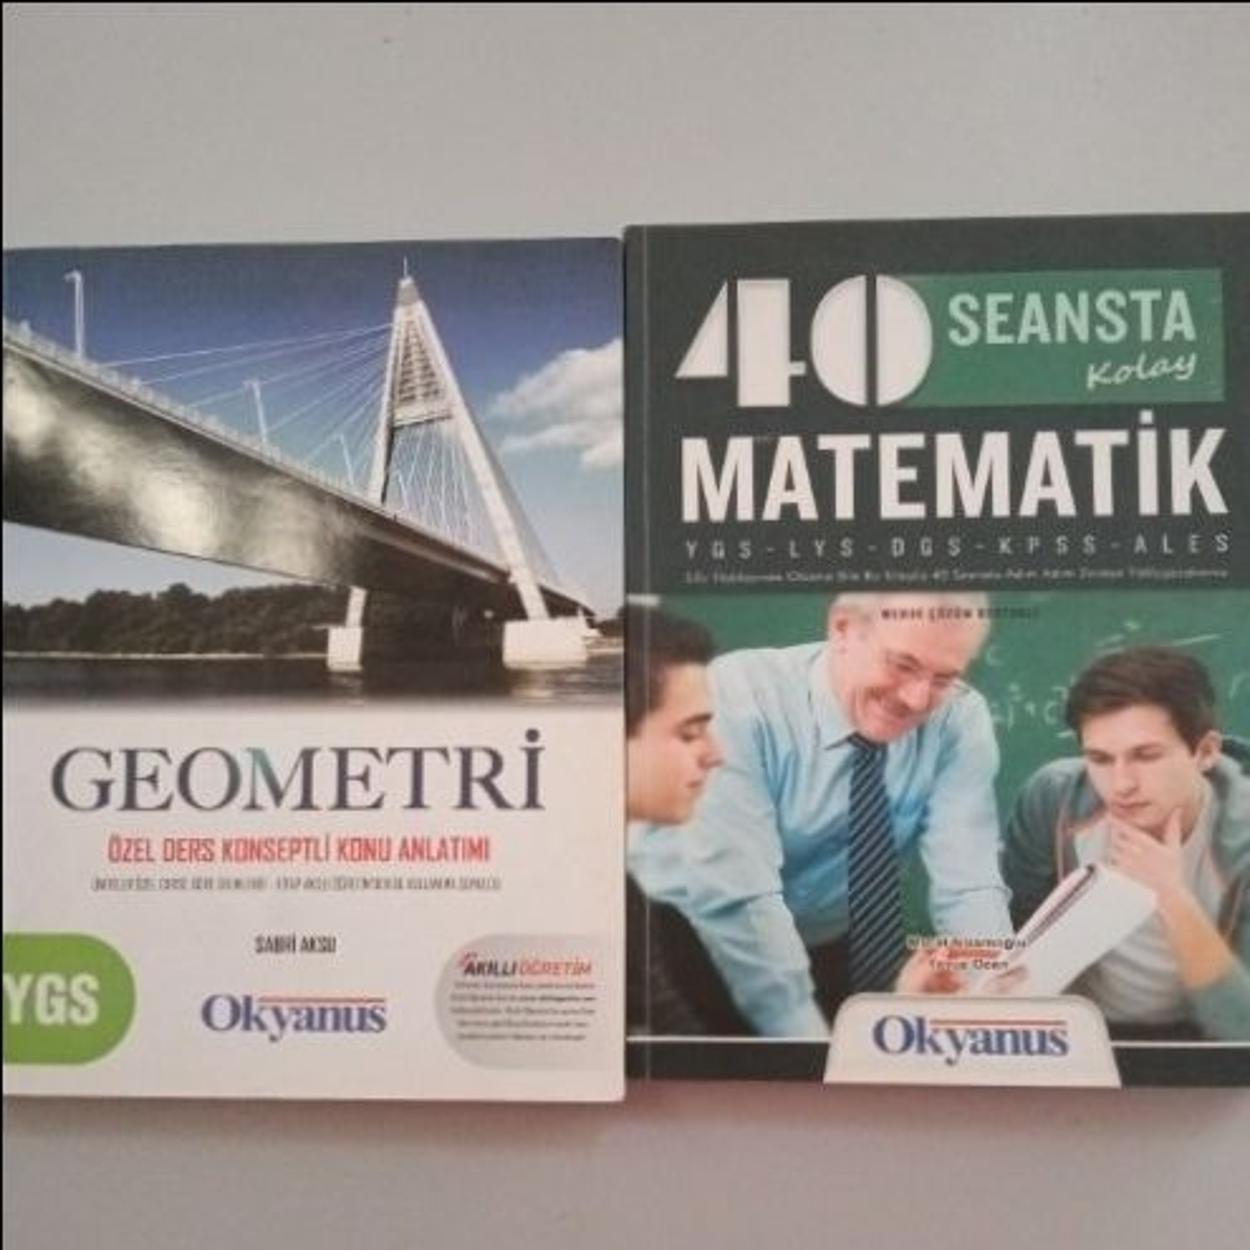 Diğer Ders/Sınav